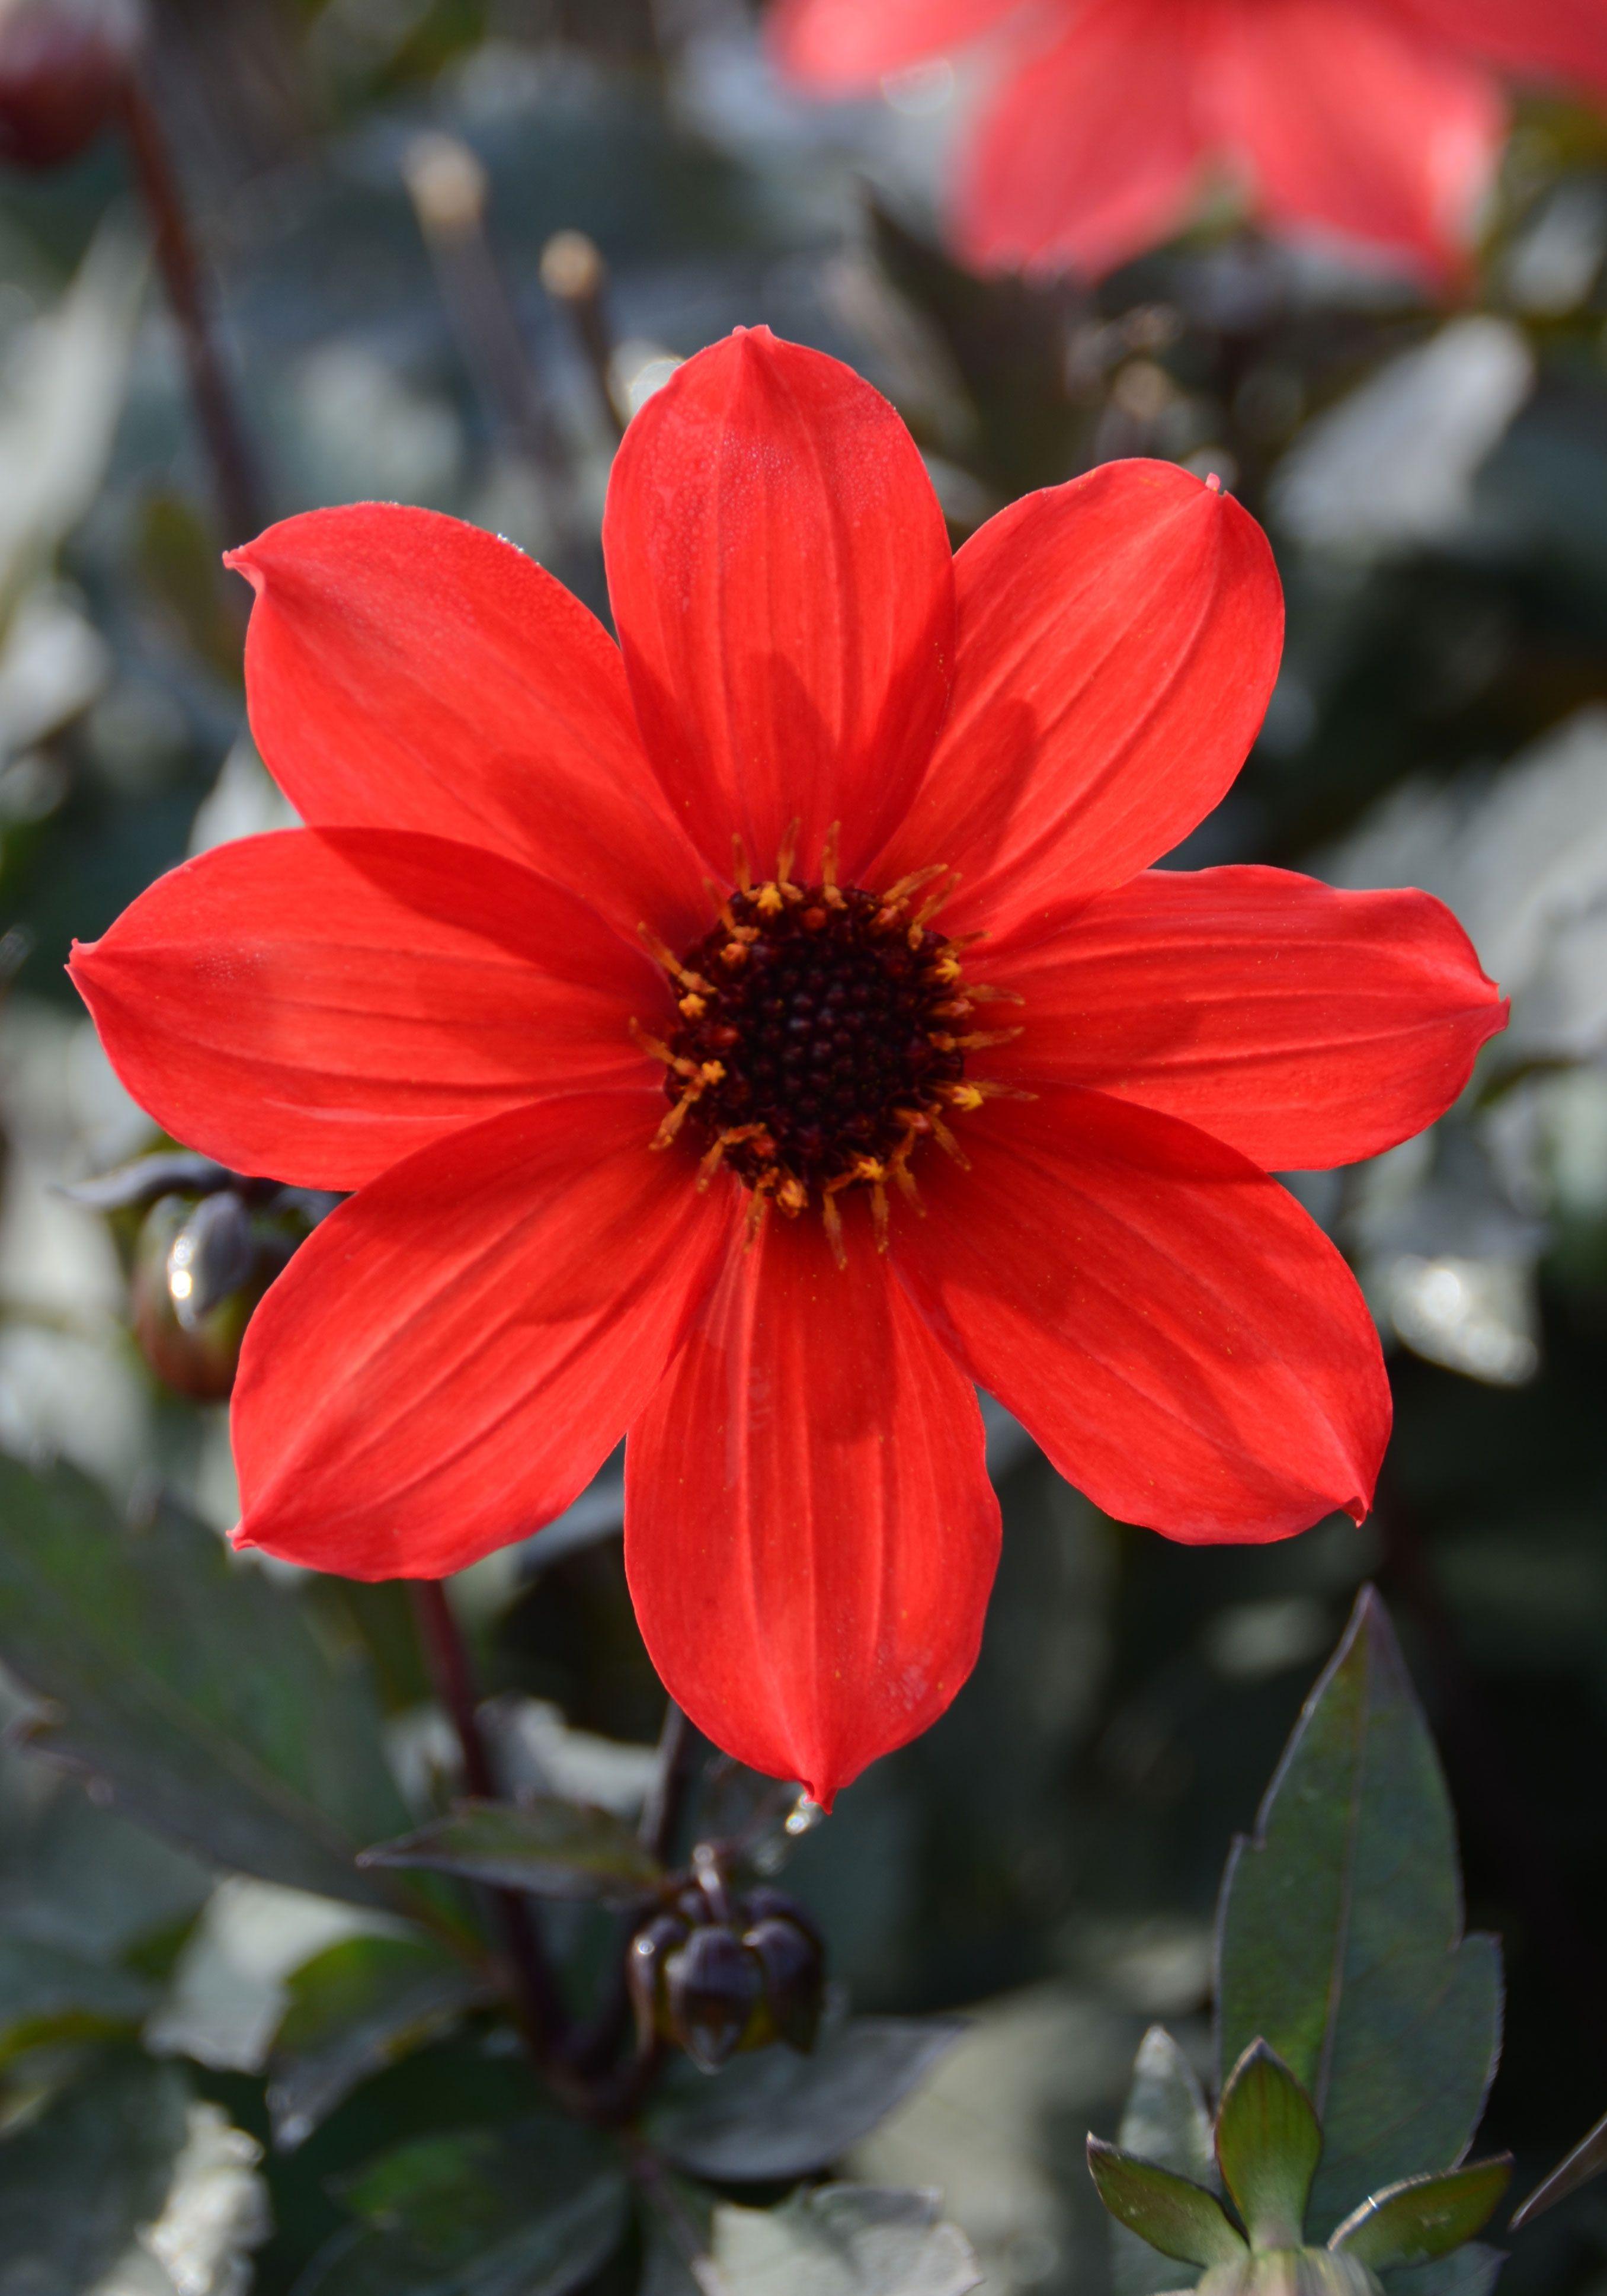 Dahlia Nain Simple Pampa Dahlia Fleur Rouge Feuillage Noir